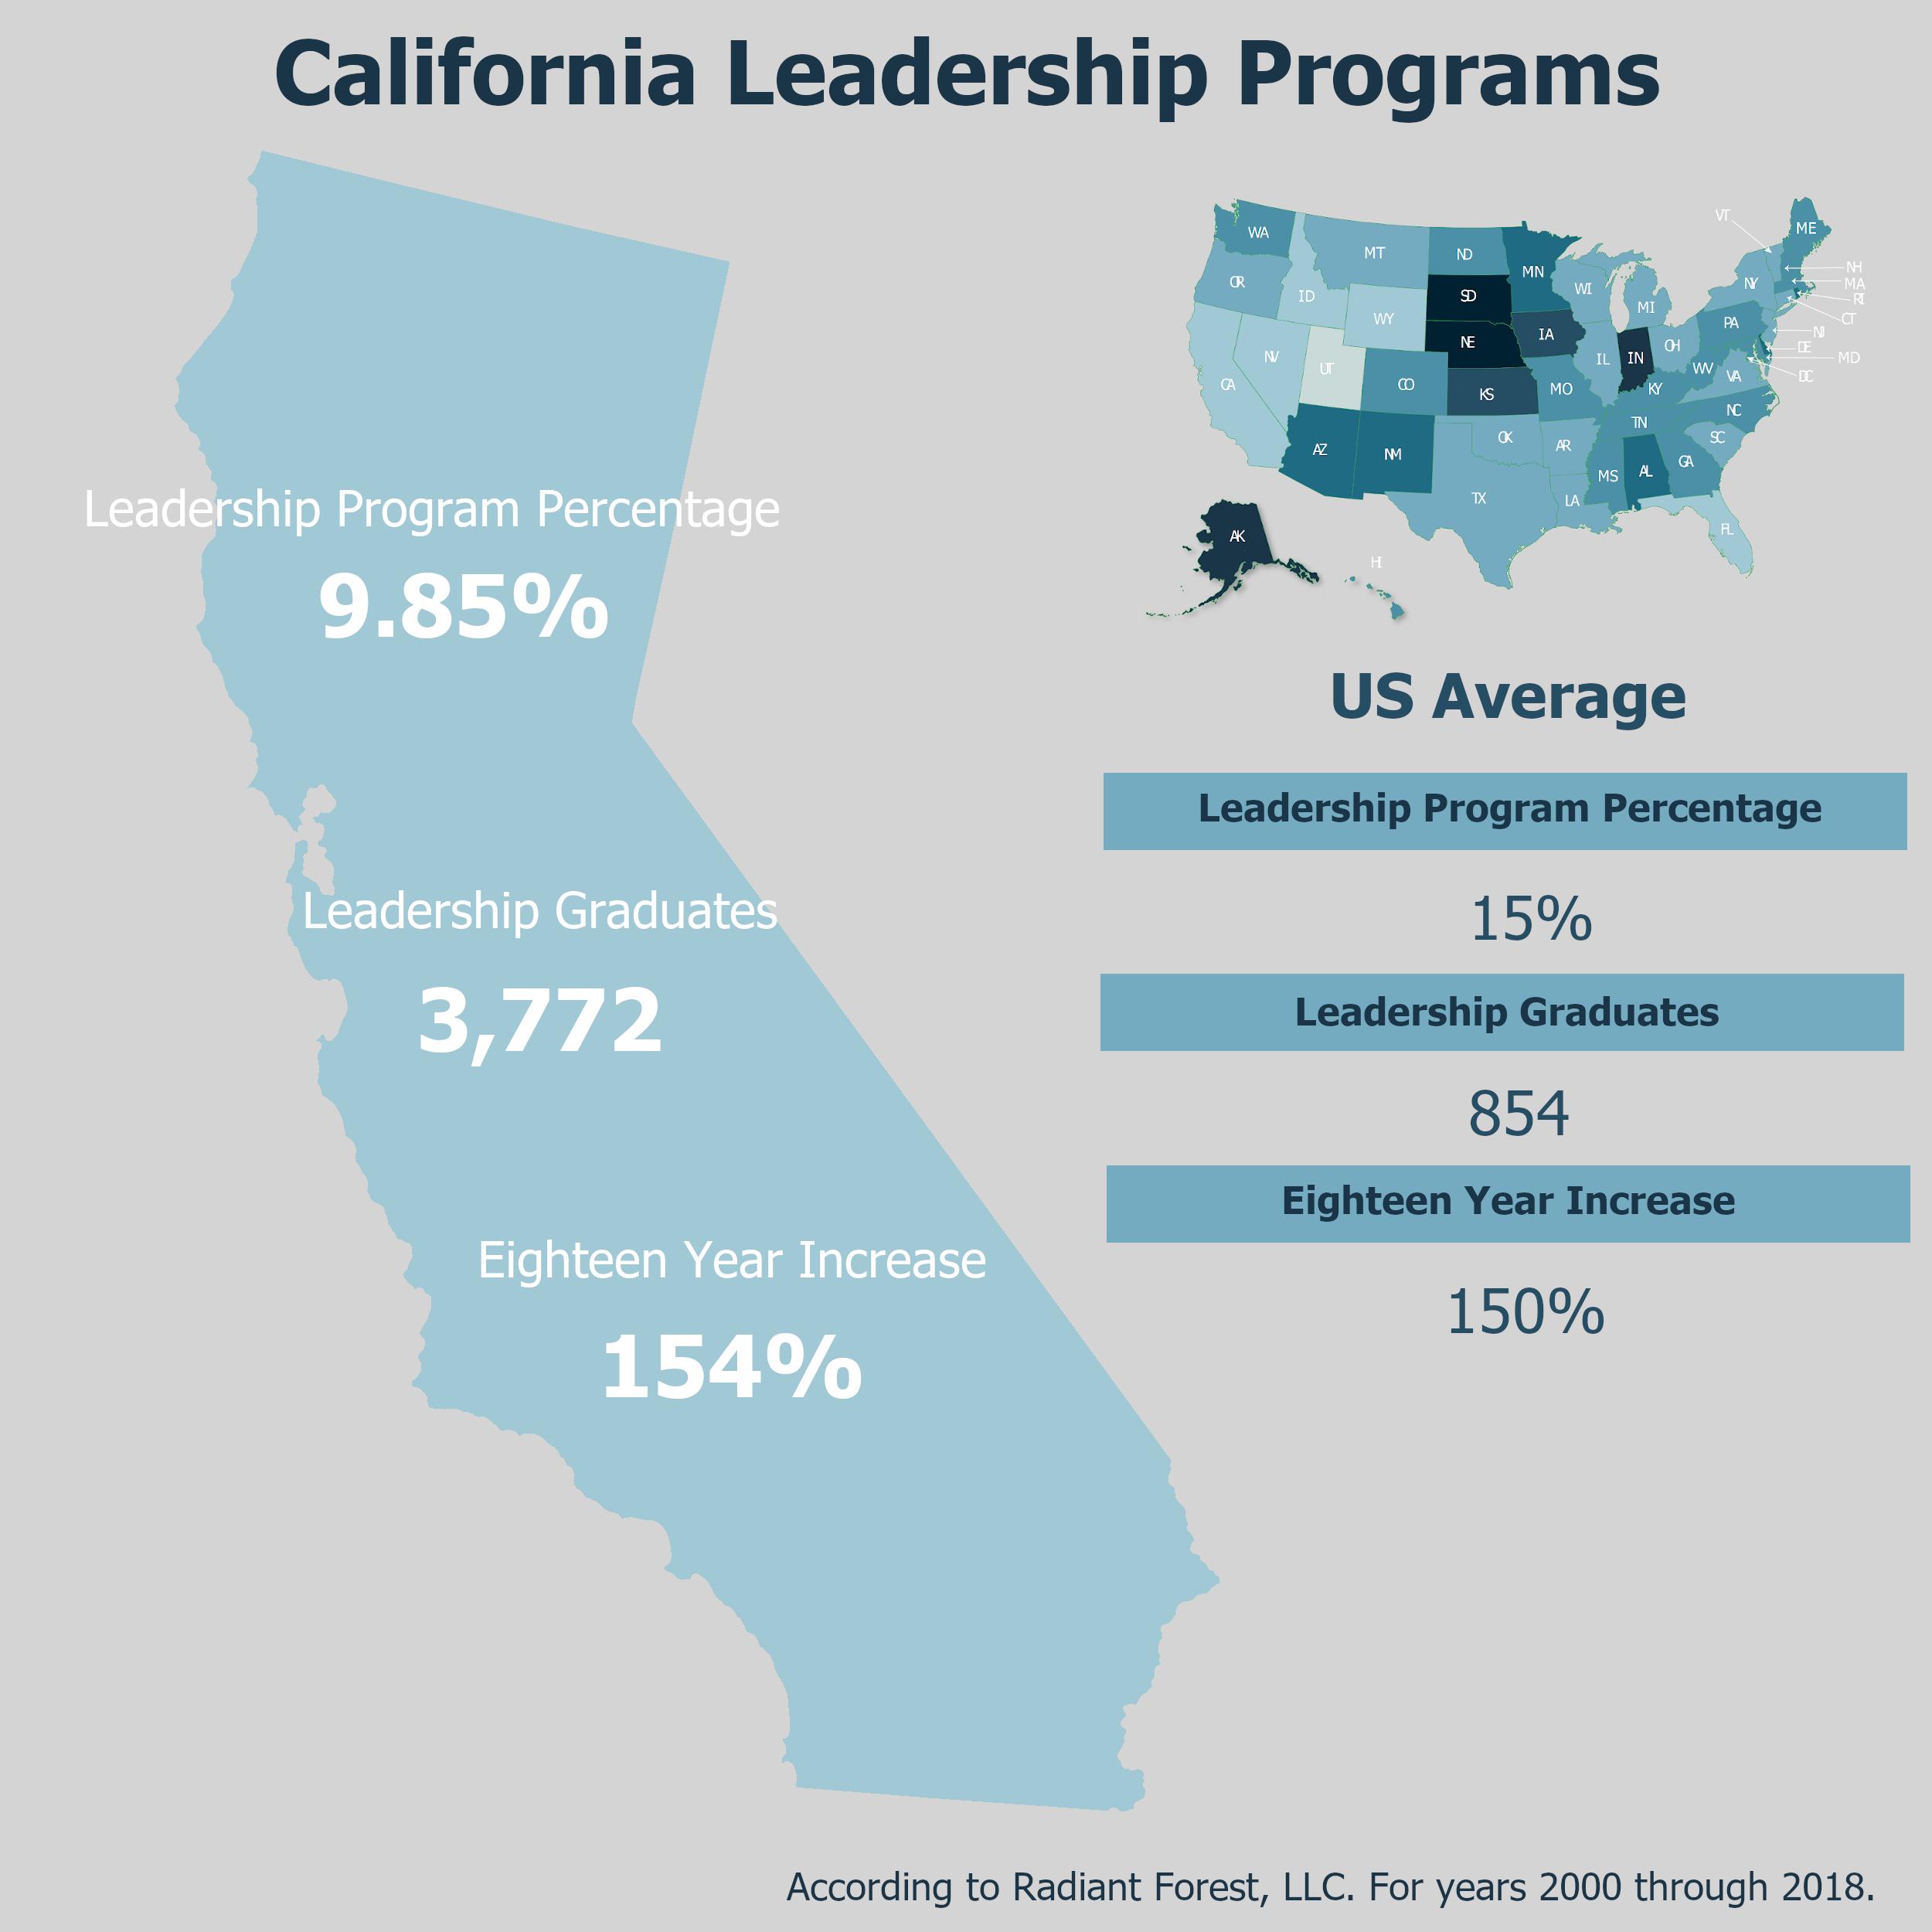 Highlight of California State Leadership Programs